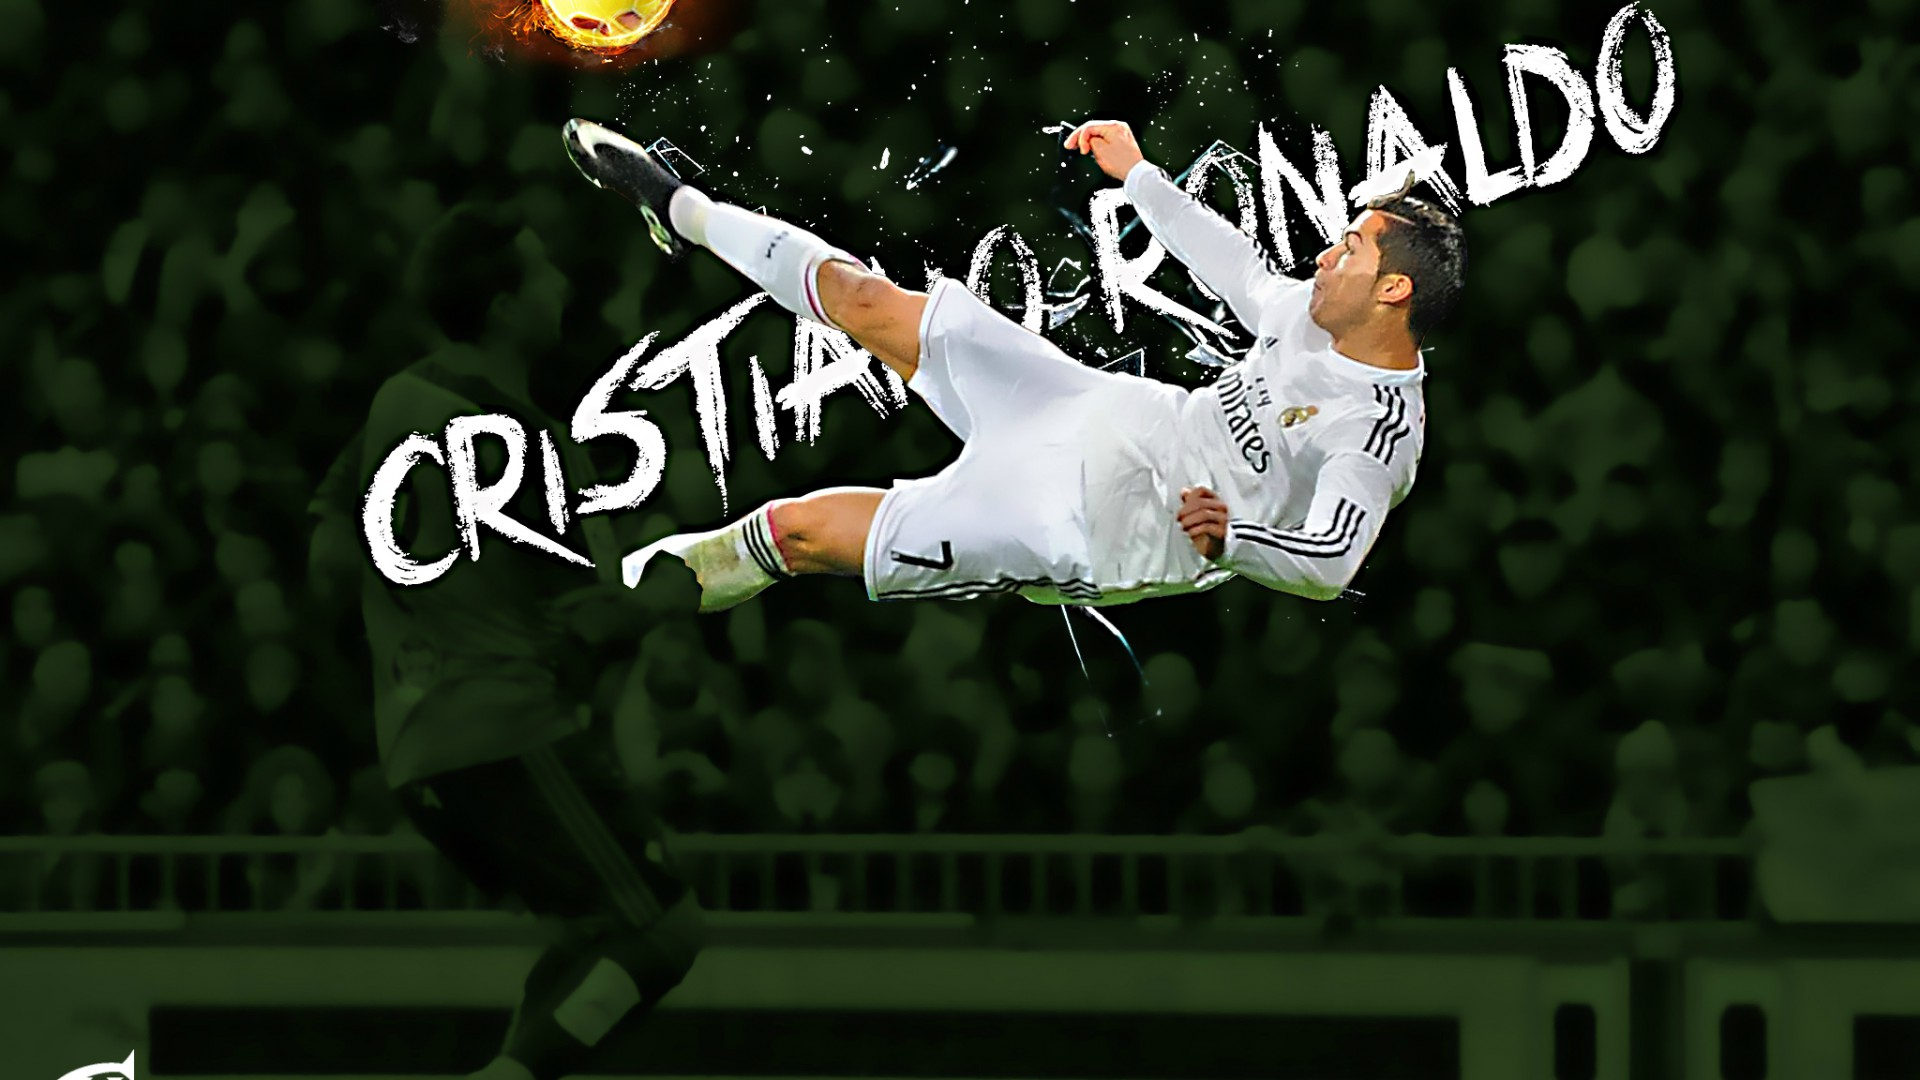 Download Cristiano Ronaldo CR7 Flying Shot Football HD Wallpaper 1920x1080